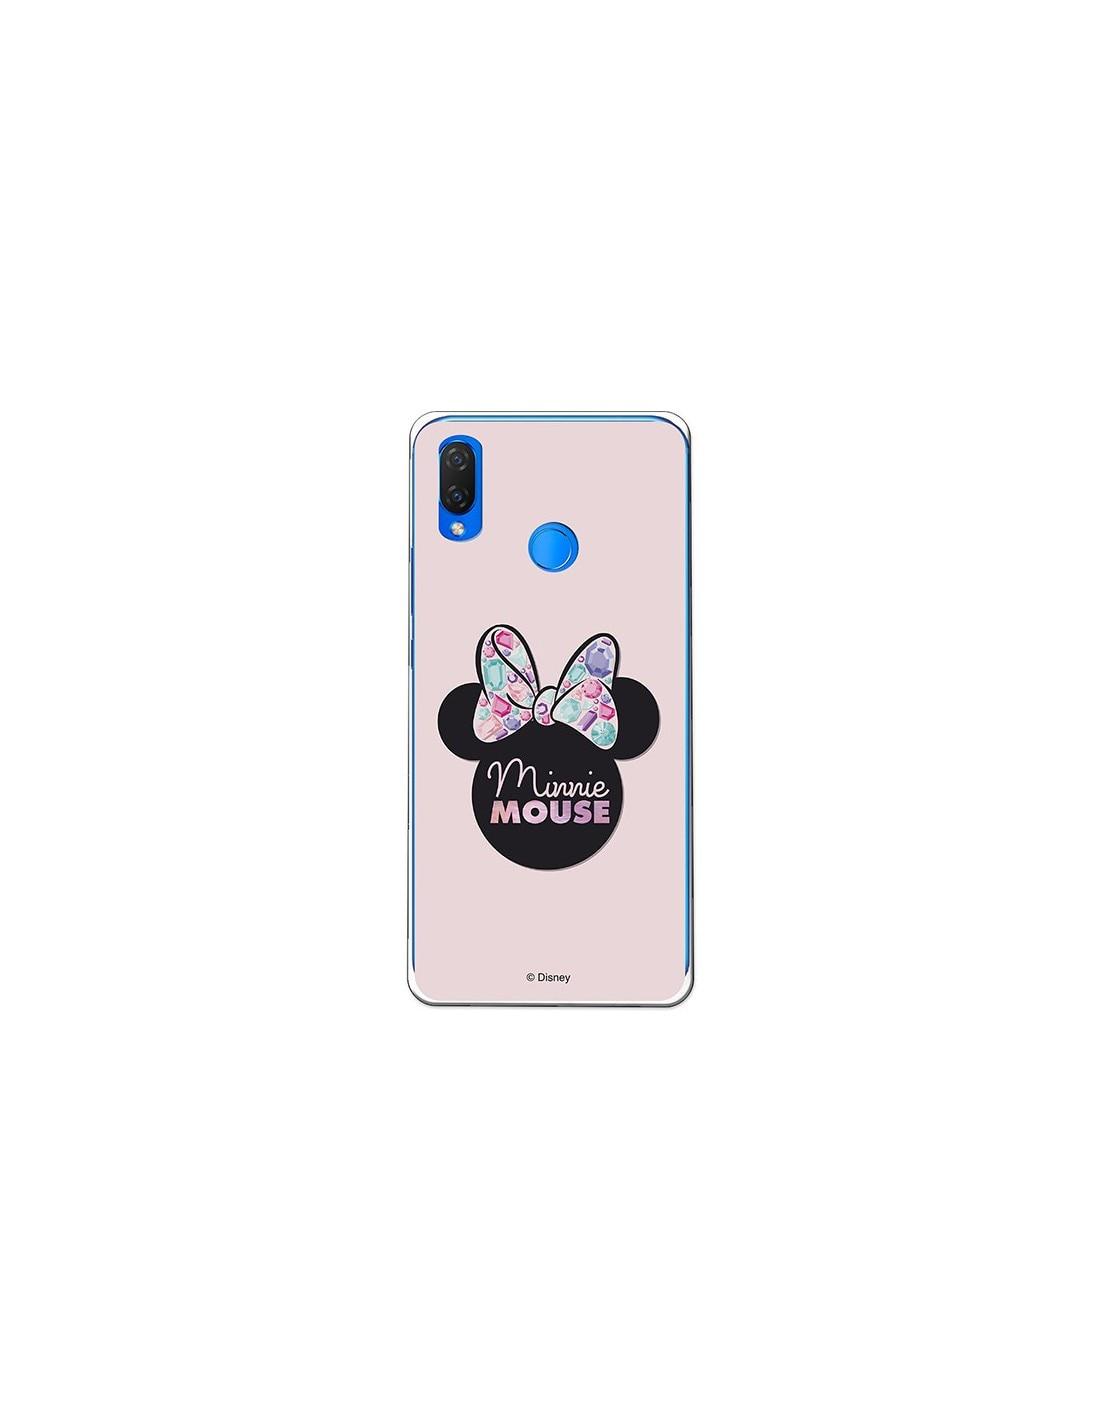 Coque officielle Disney Minnie, ombre rose Huawei P Smart Plus